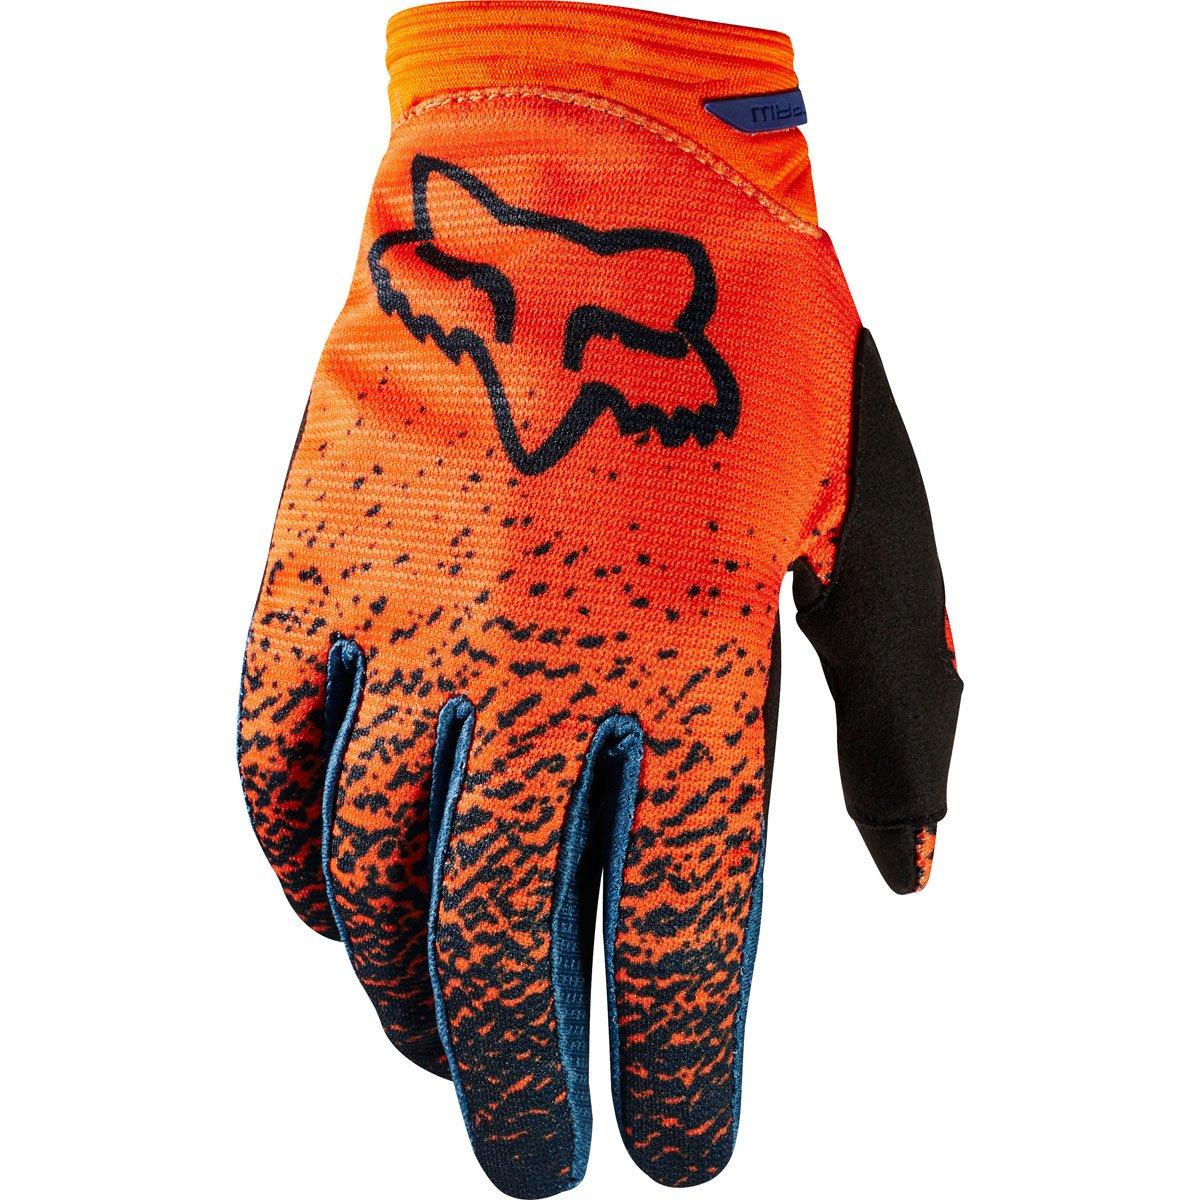 2018 Fox Racing Womens Dirtpaw Gloves-Grey/Orange-M